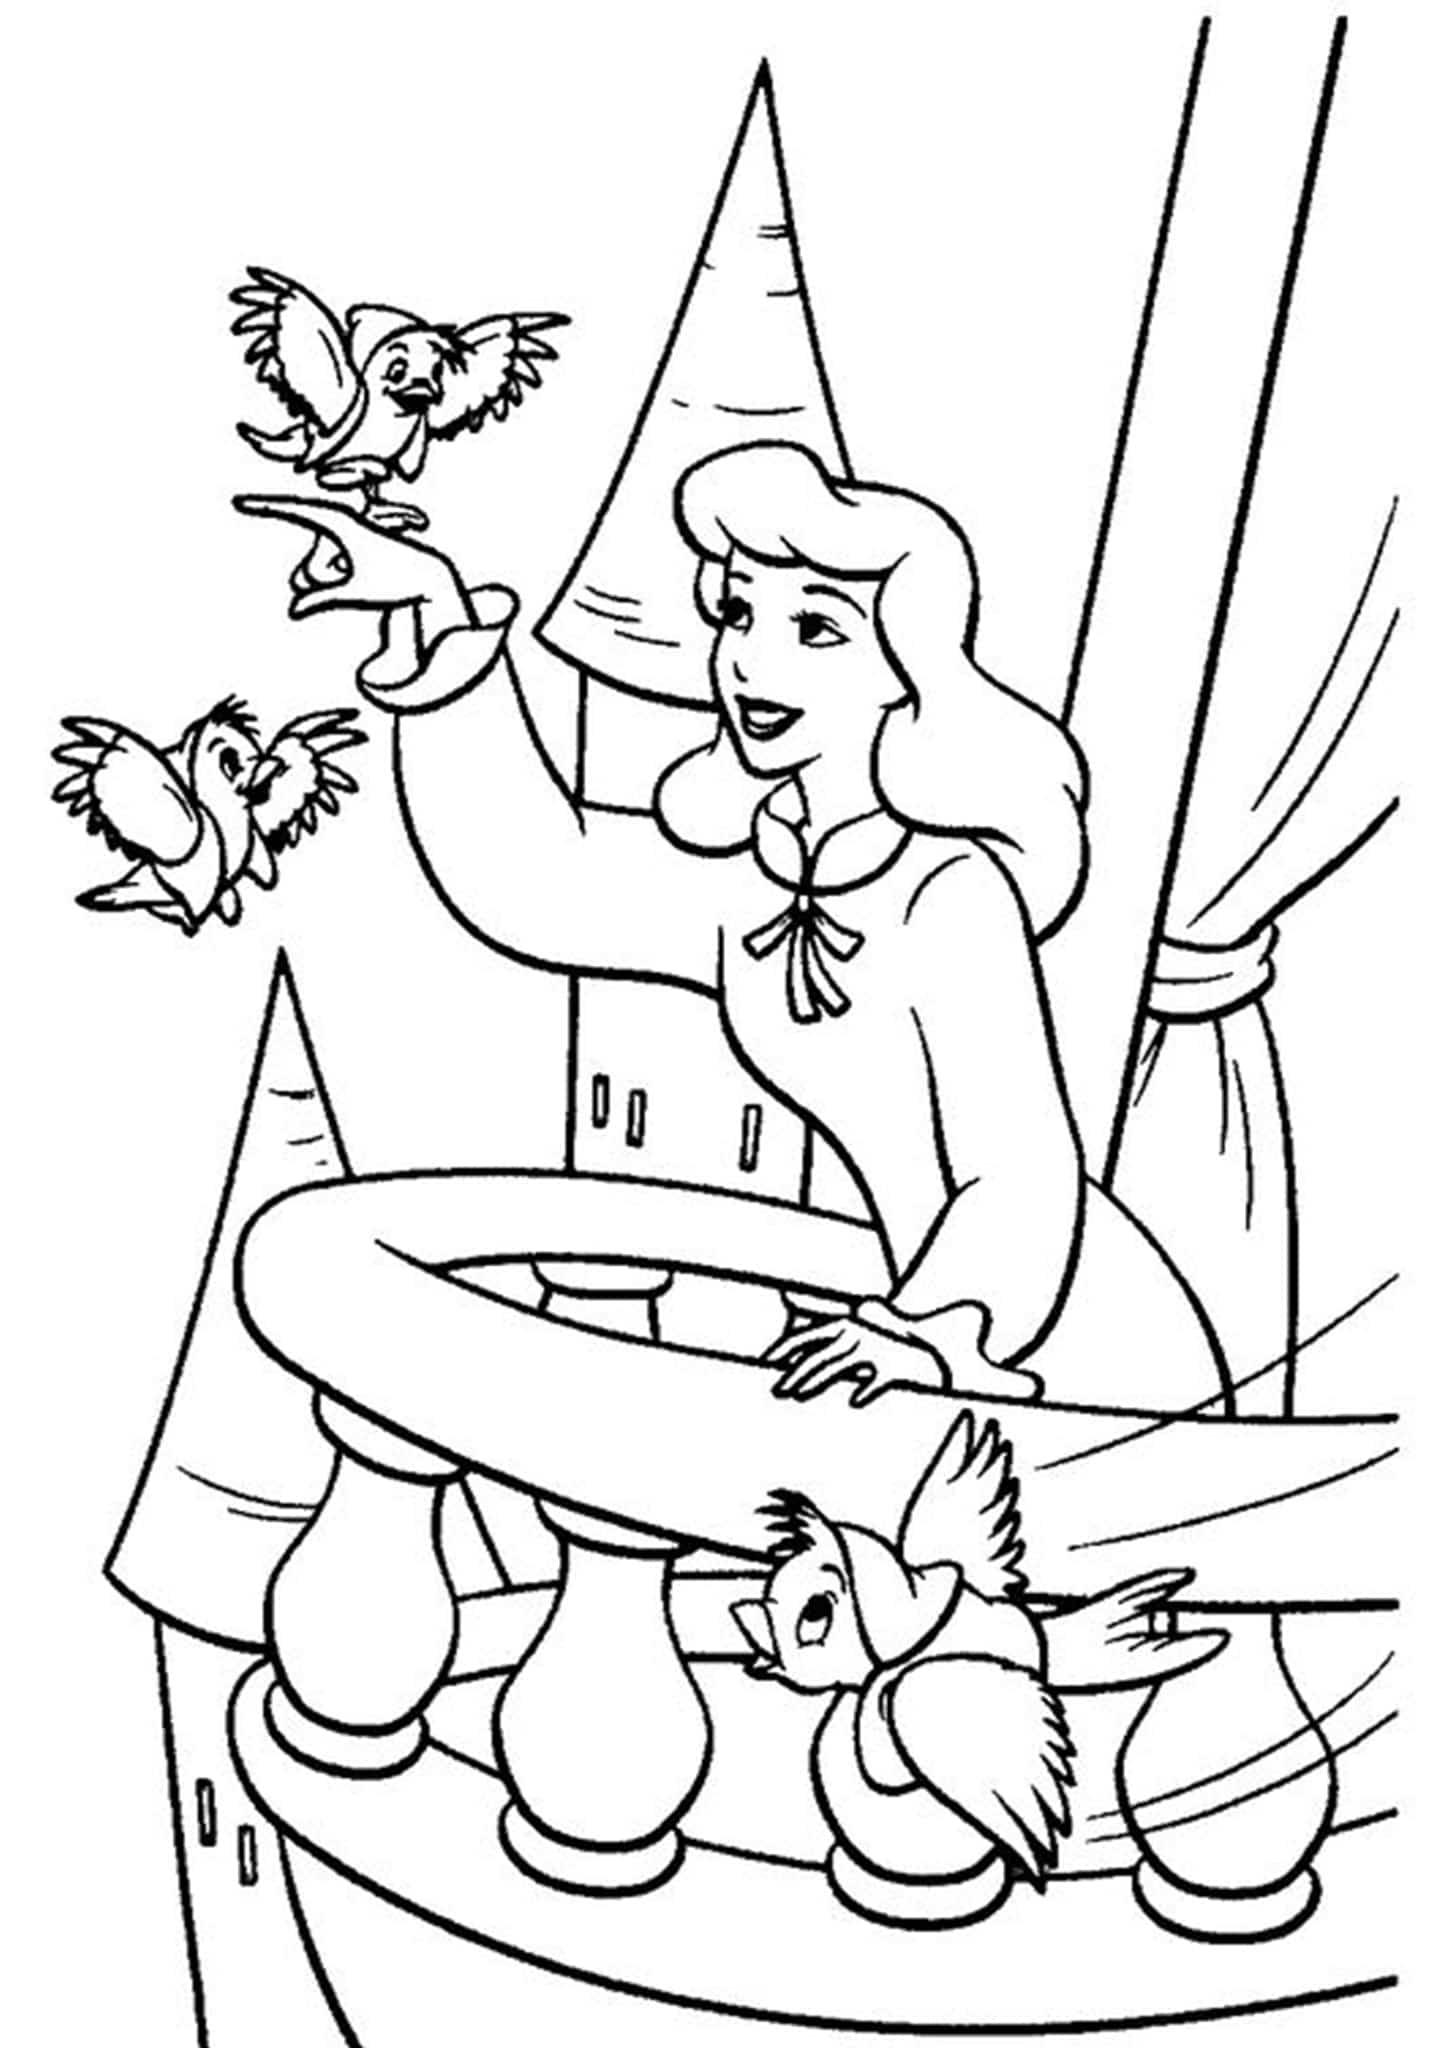 Free & Easy To Print Cinderella Coloring Pages - Tulamama